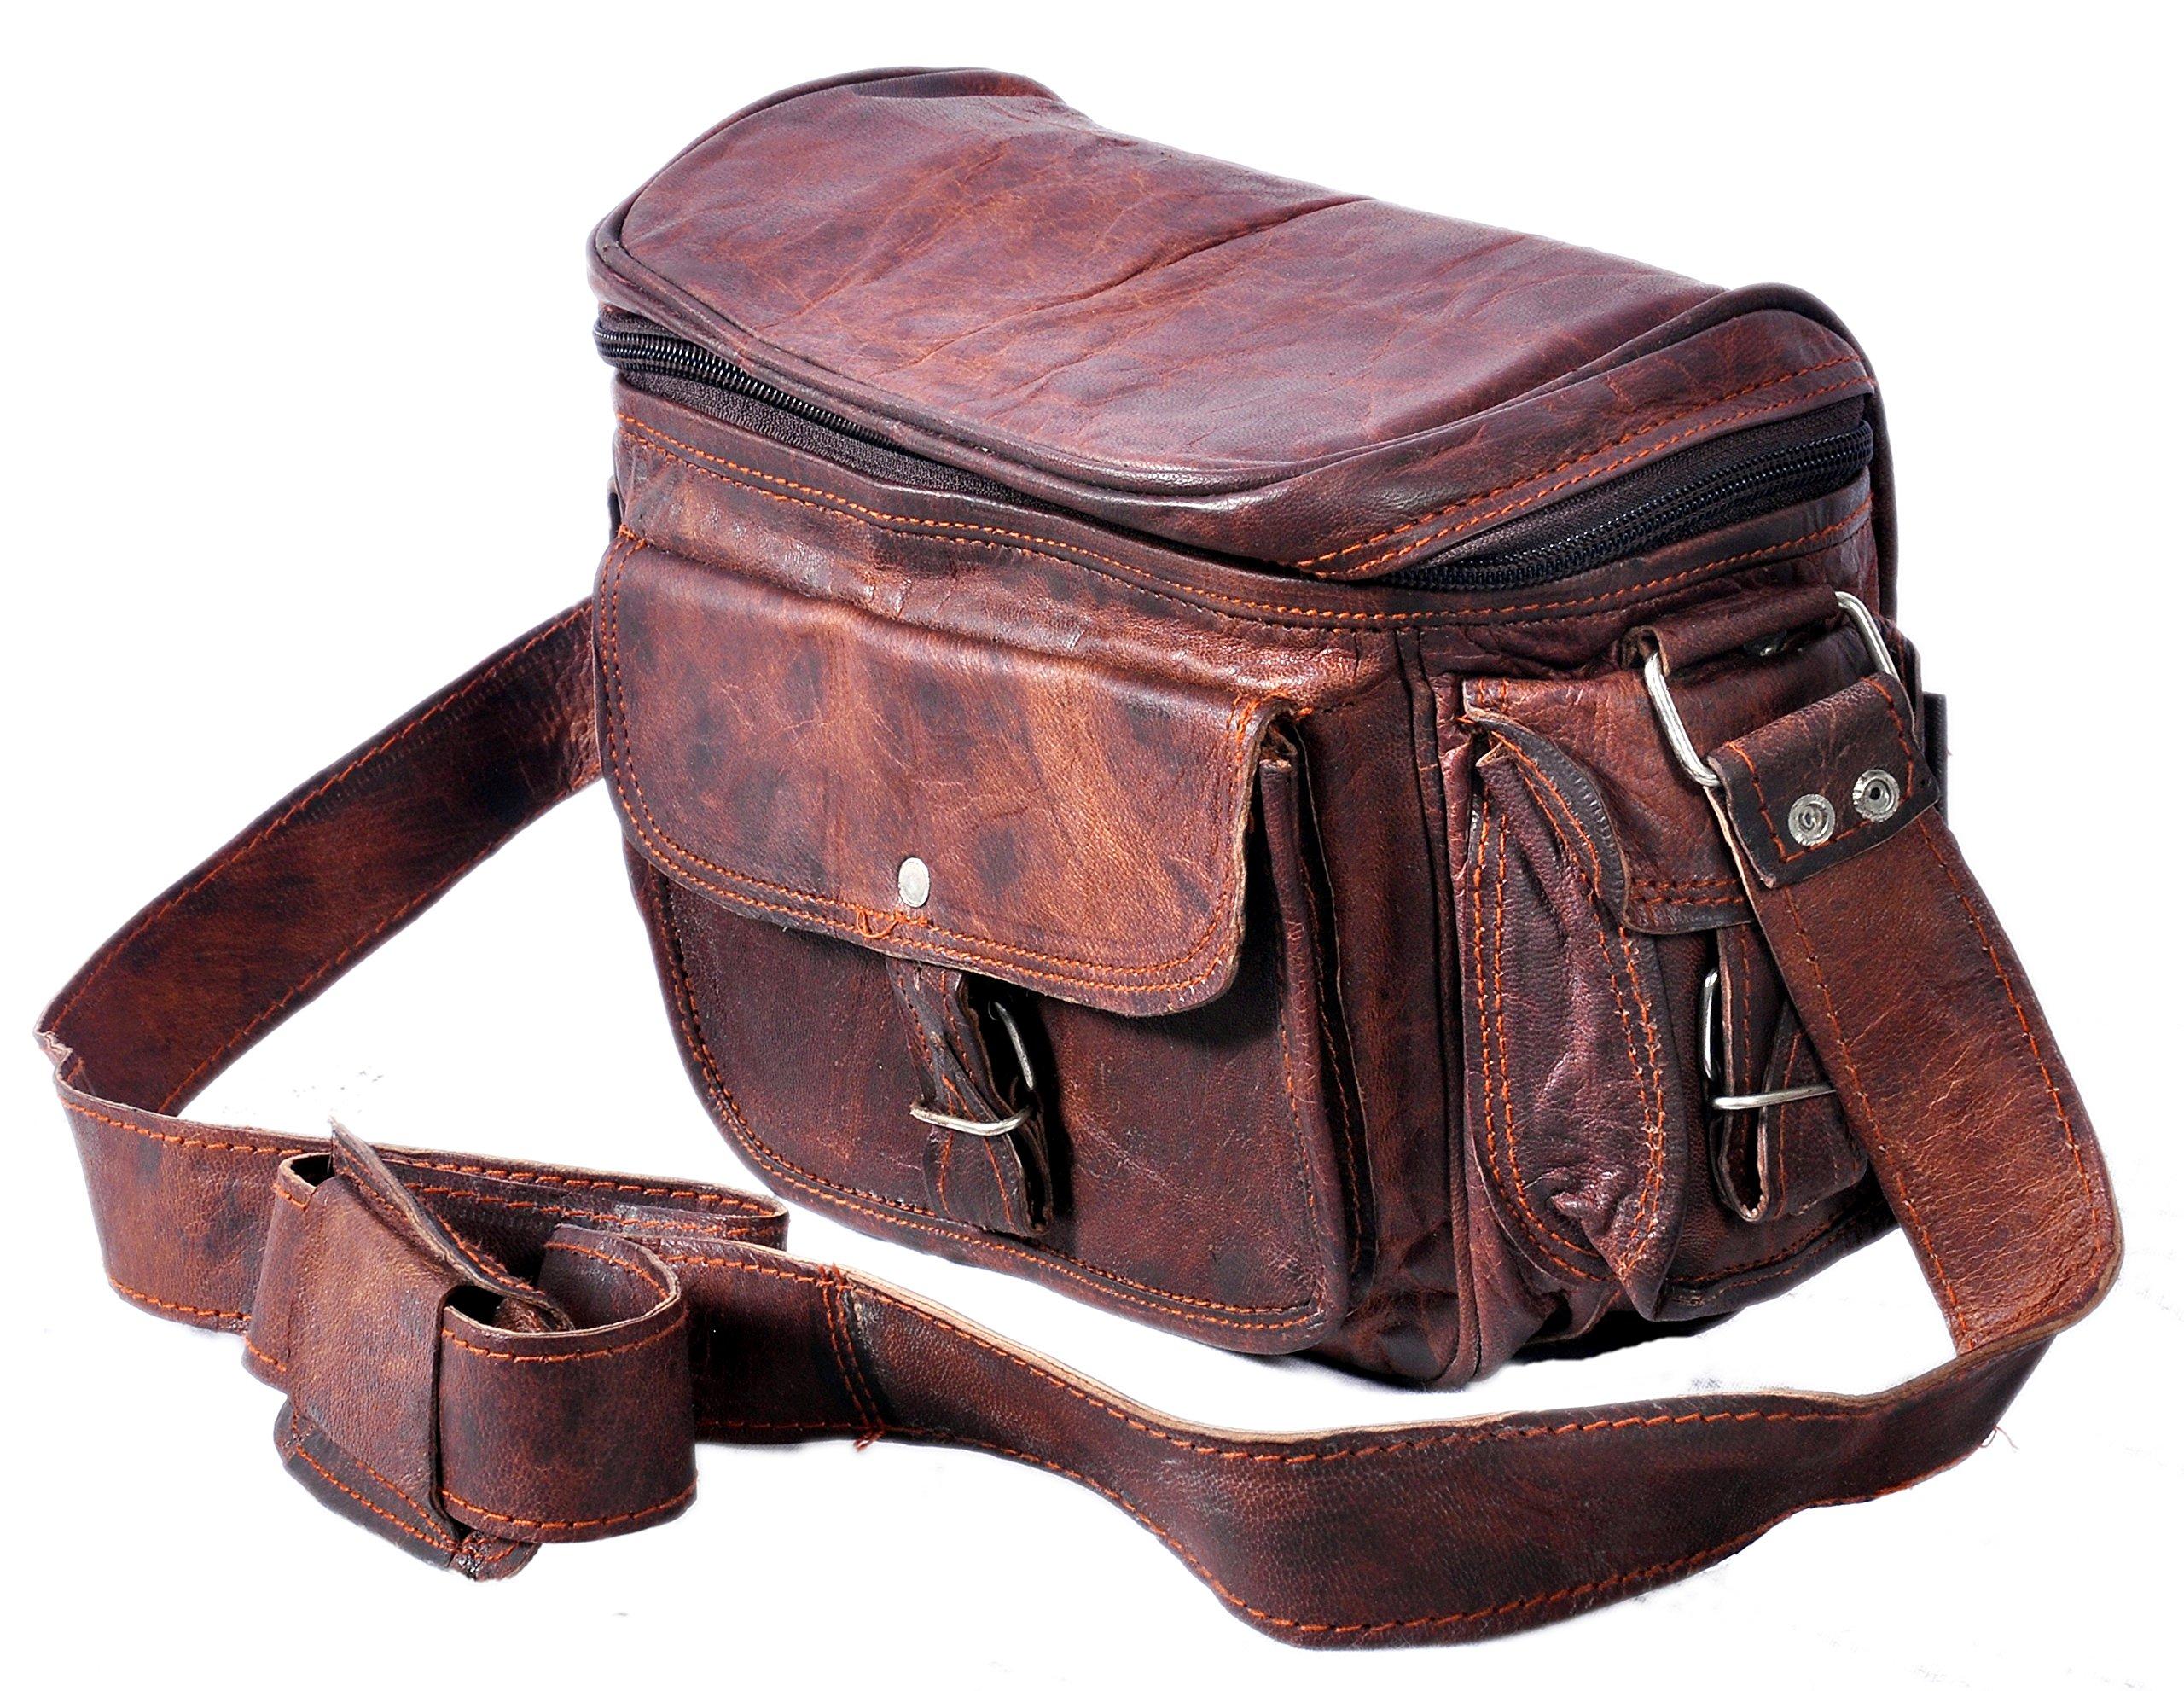 QualityArt Real Leather camera bag Women camera Satchel Travel Camera Case Women Purse 9x7x5